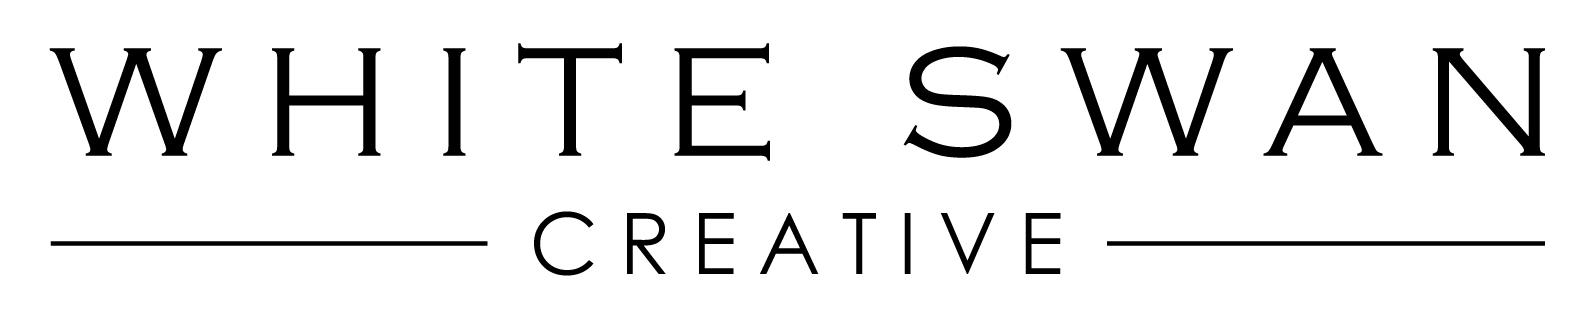 White Swan Creative